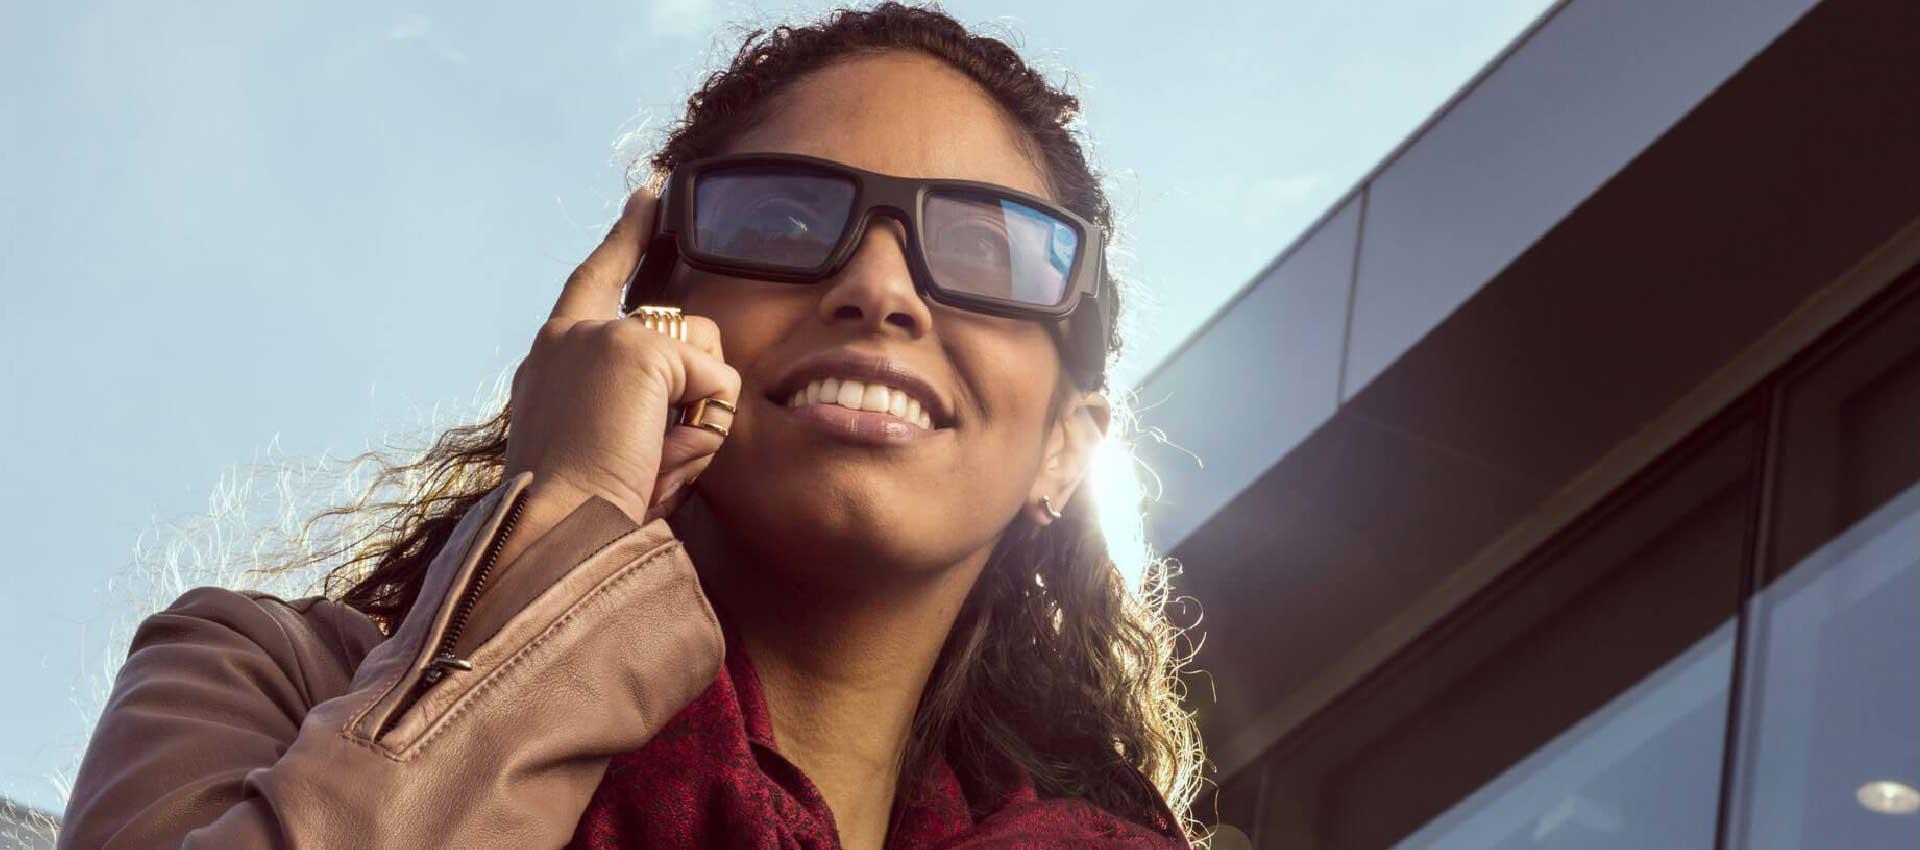 Vuzix Blade AR Smart Glasses